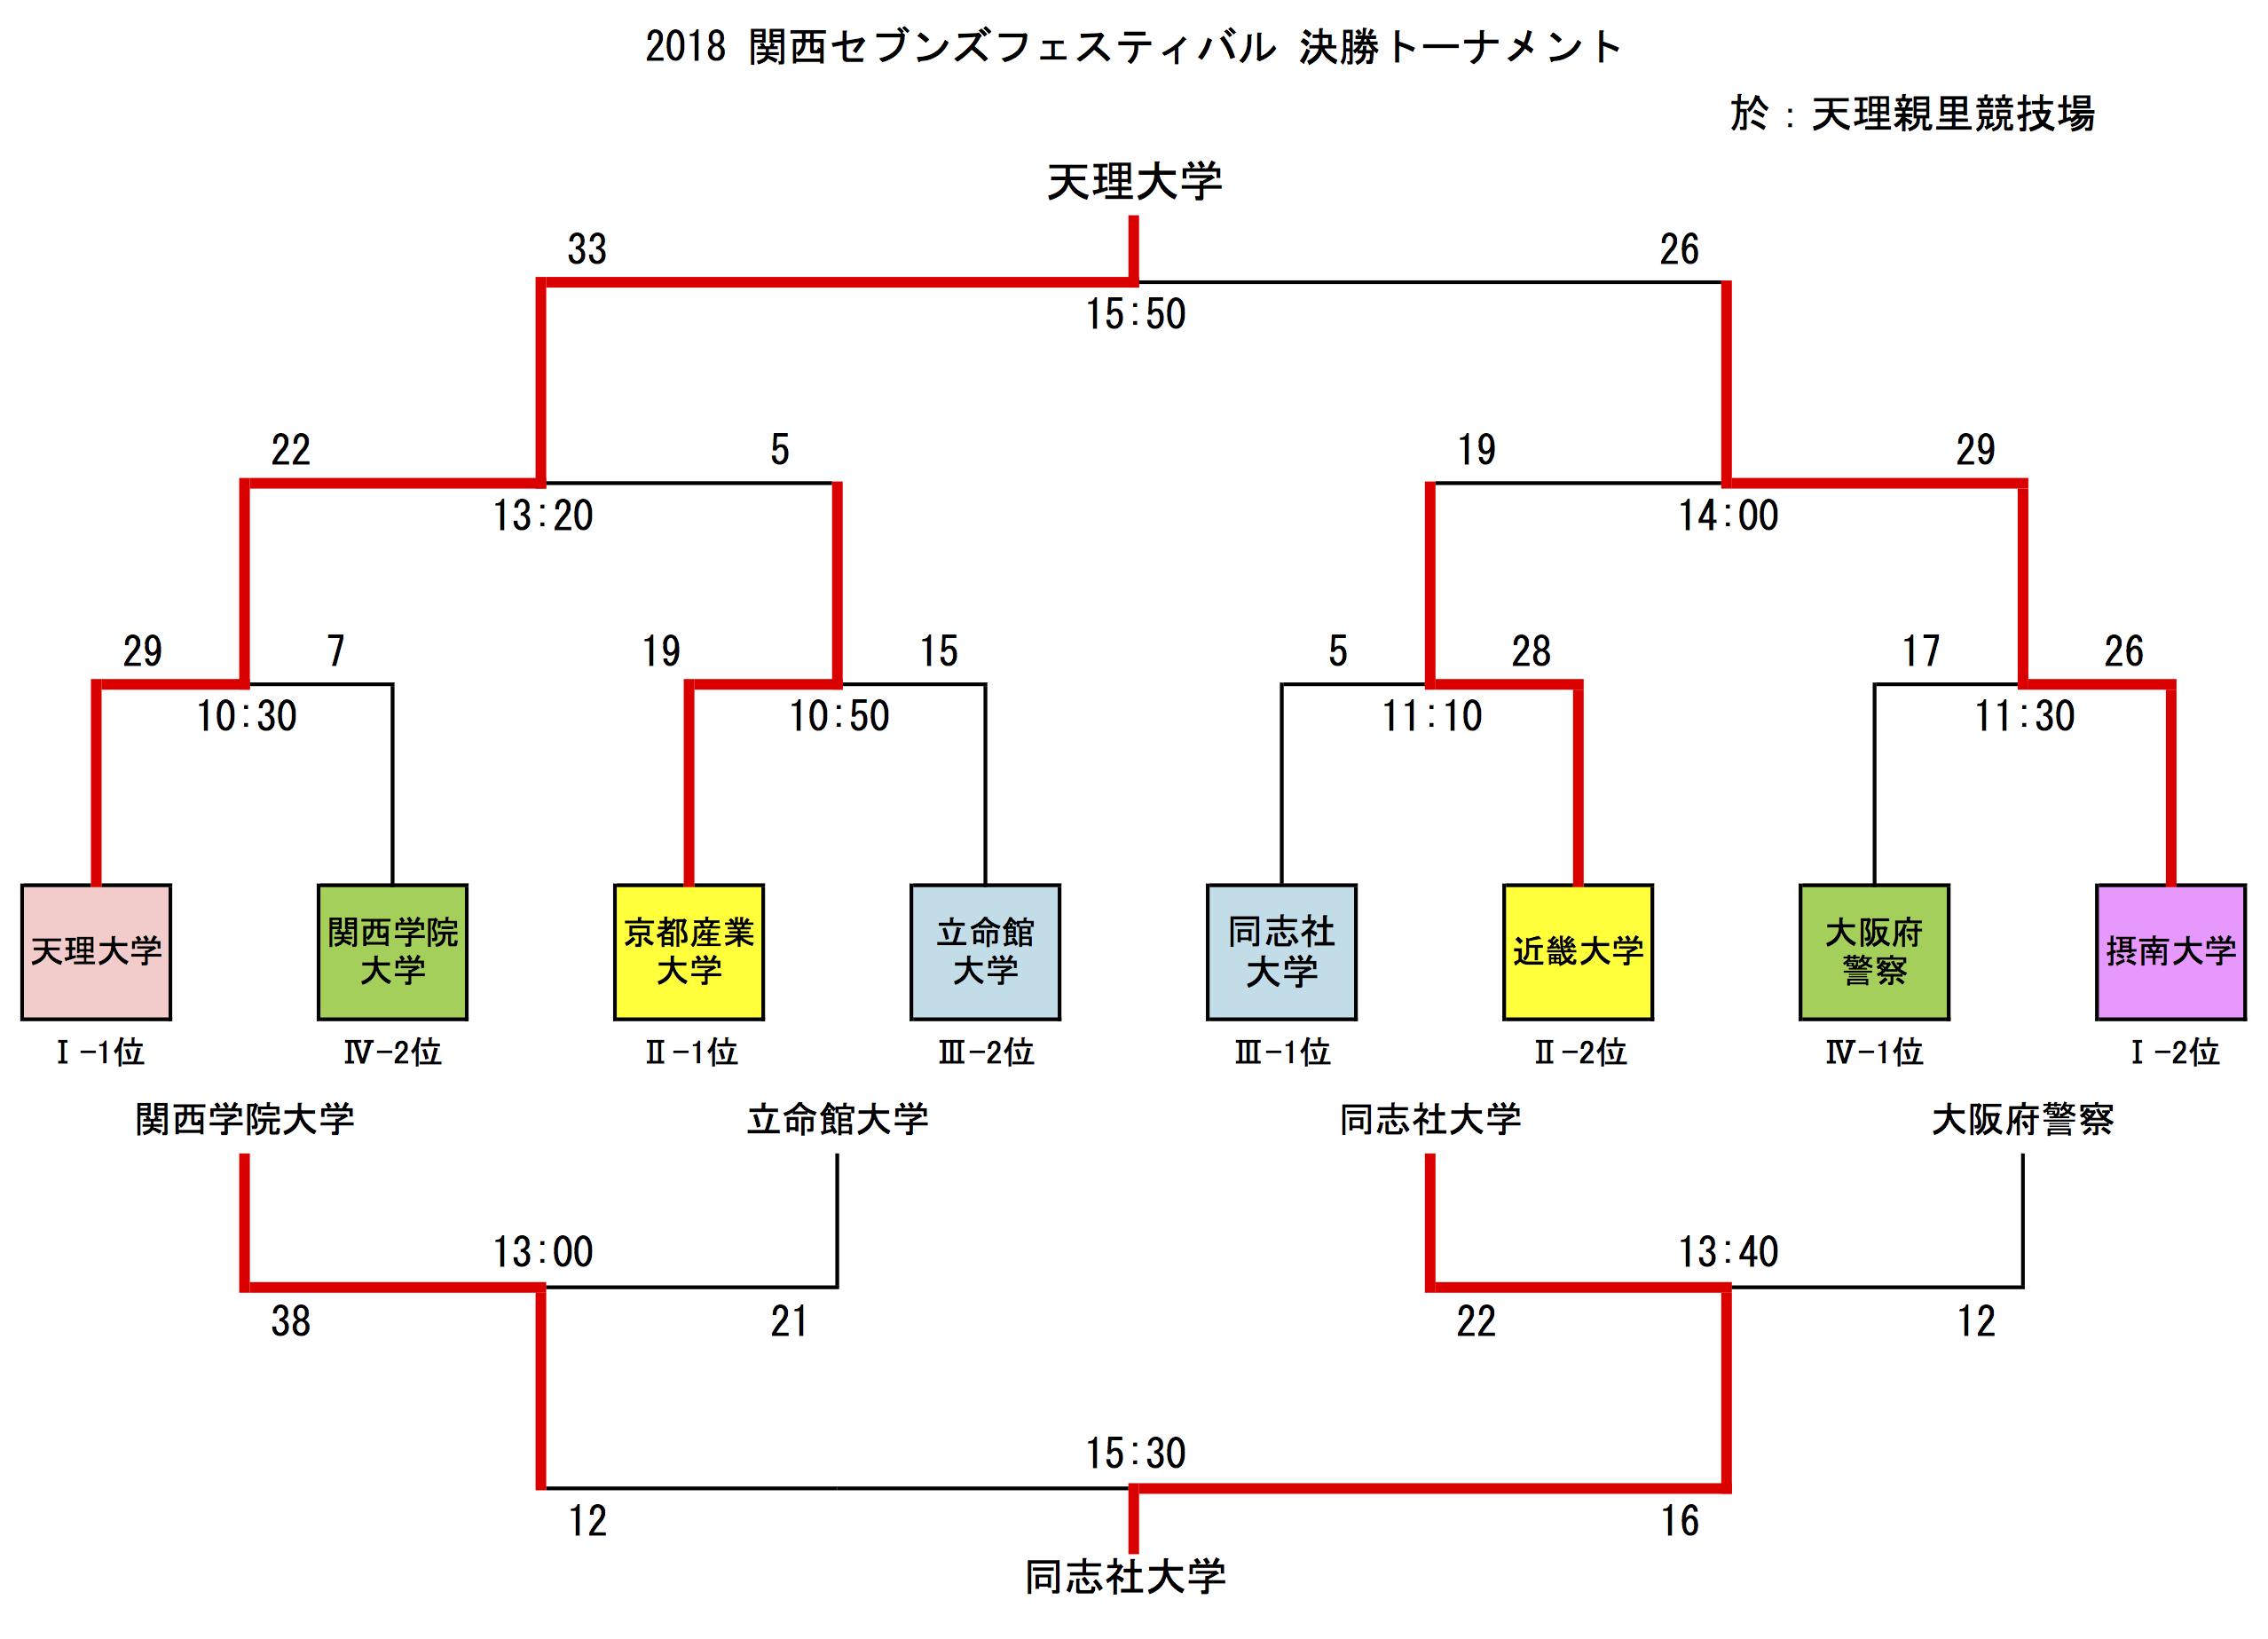 Kansai7s2018Result